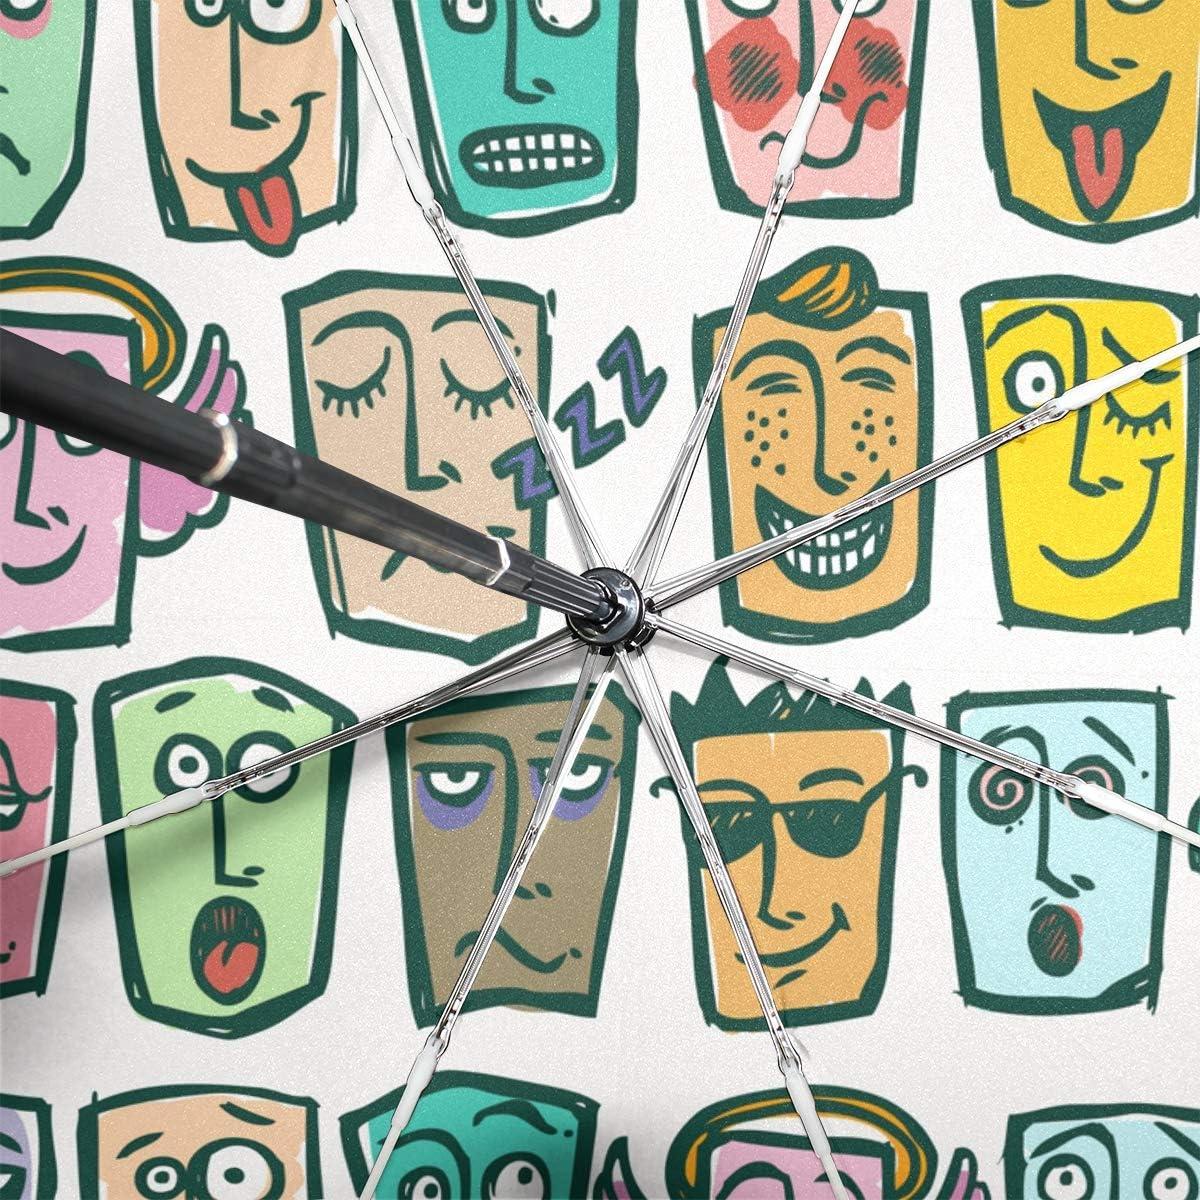 Black Glue Anti UV Coating Compact Travel Umbrella for women men ANINILY Abstract Facial Expression Mask Folding Umbrella Windproof Auto Open Close